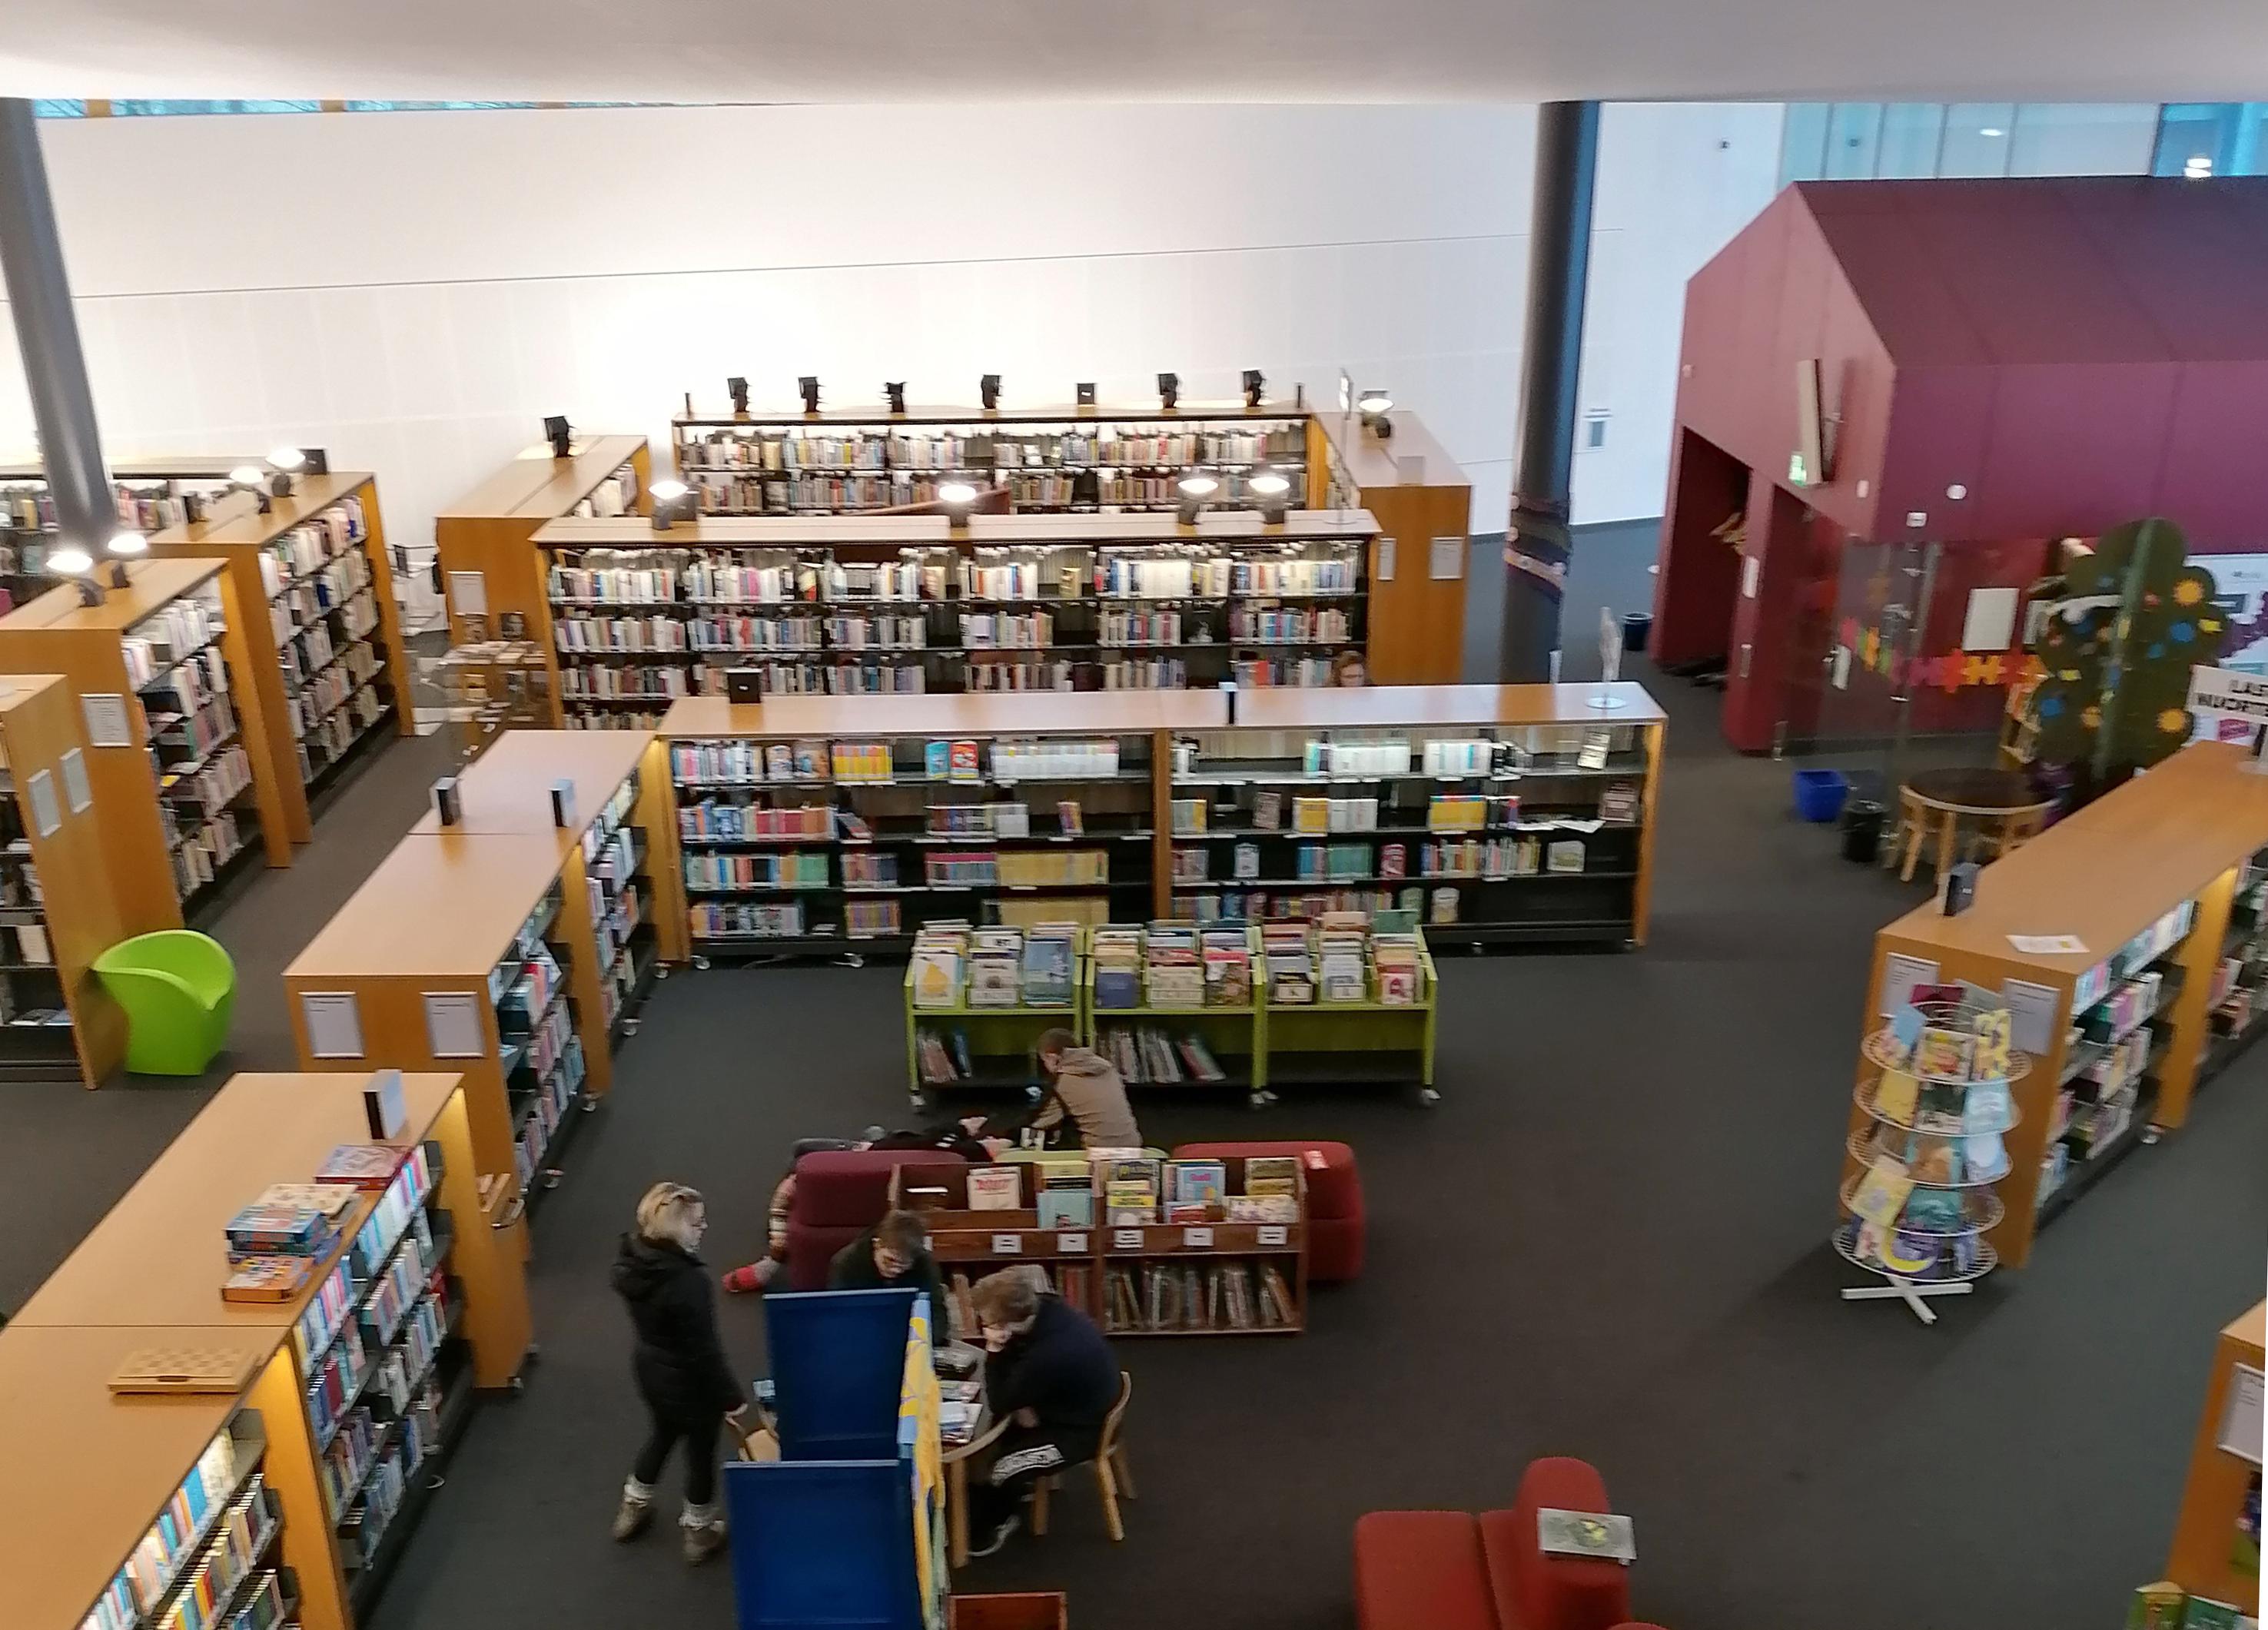 Limingan kirjasto.